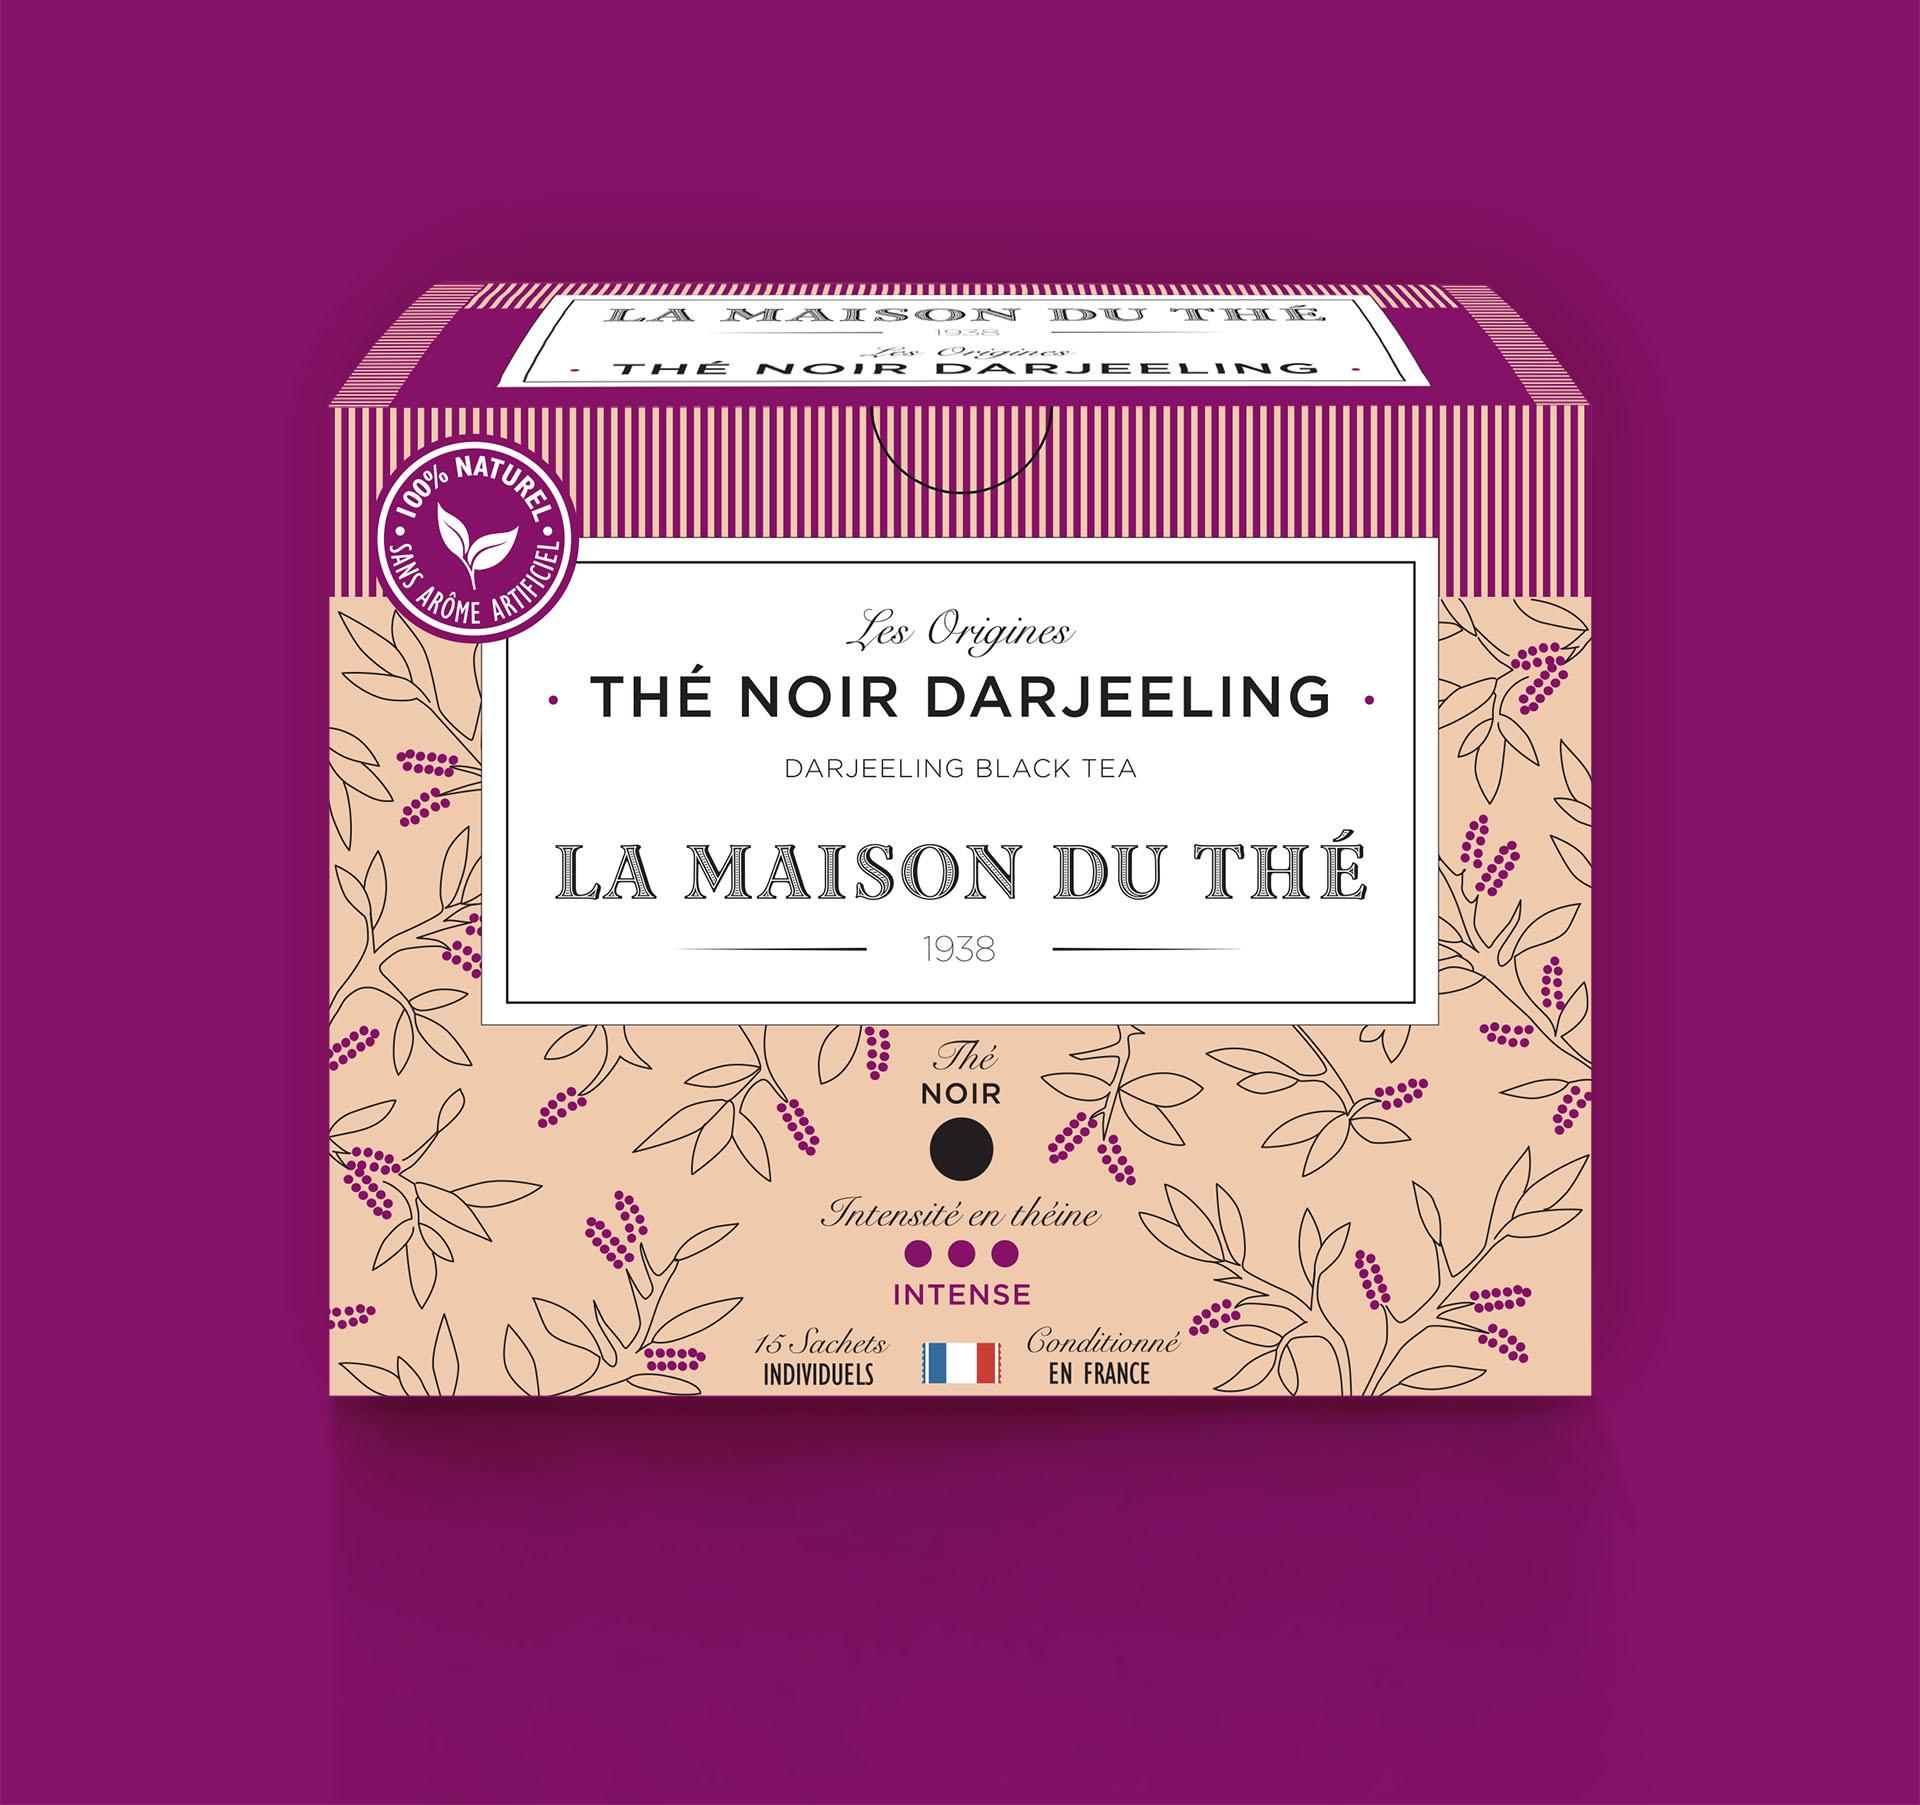 Thé noir Darjeeling, les Origines